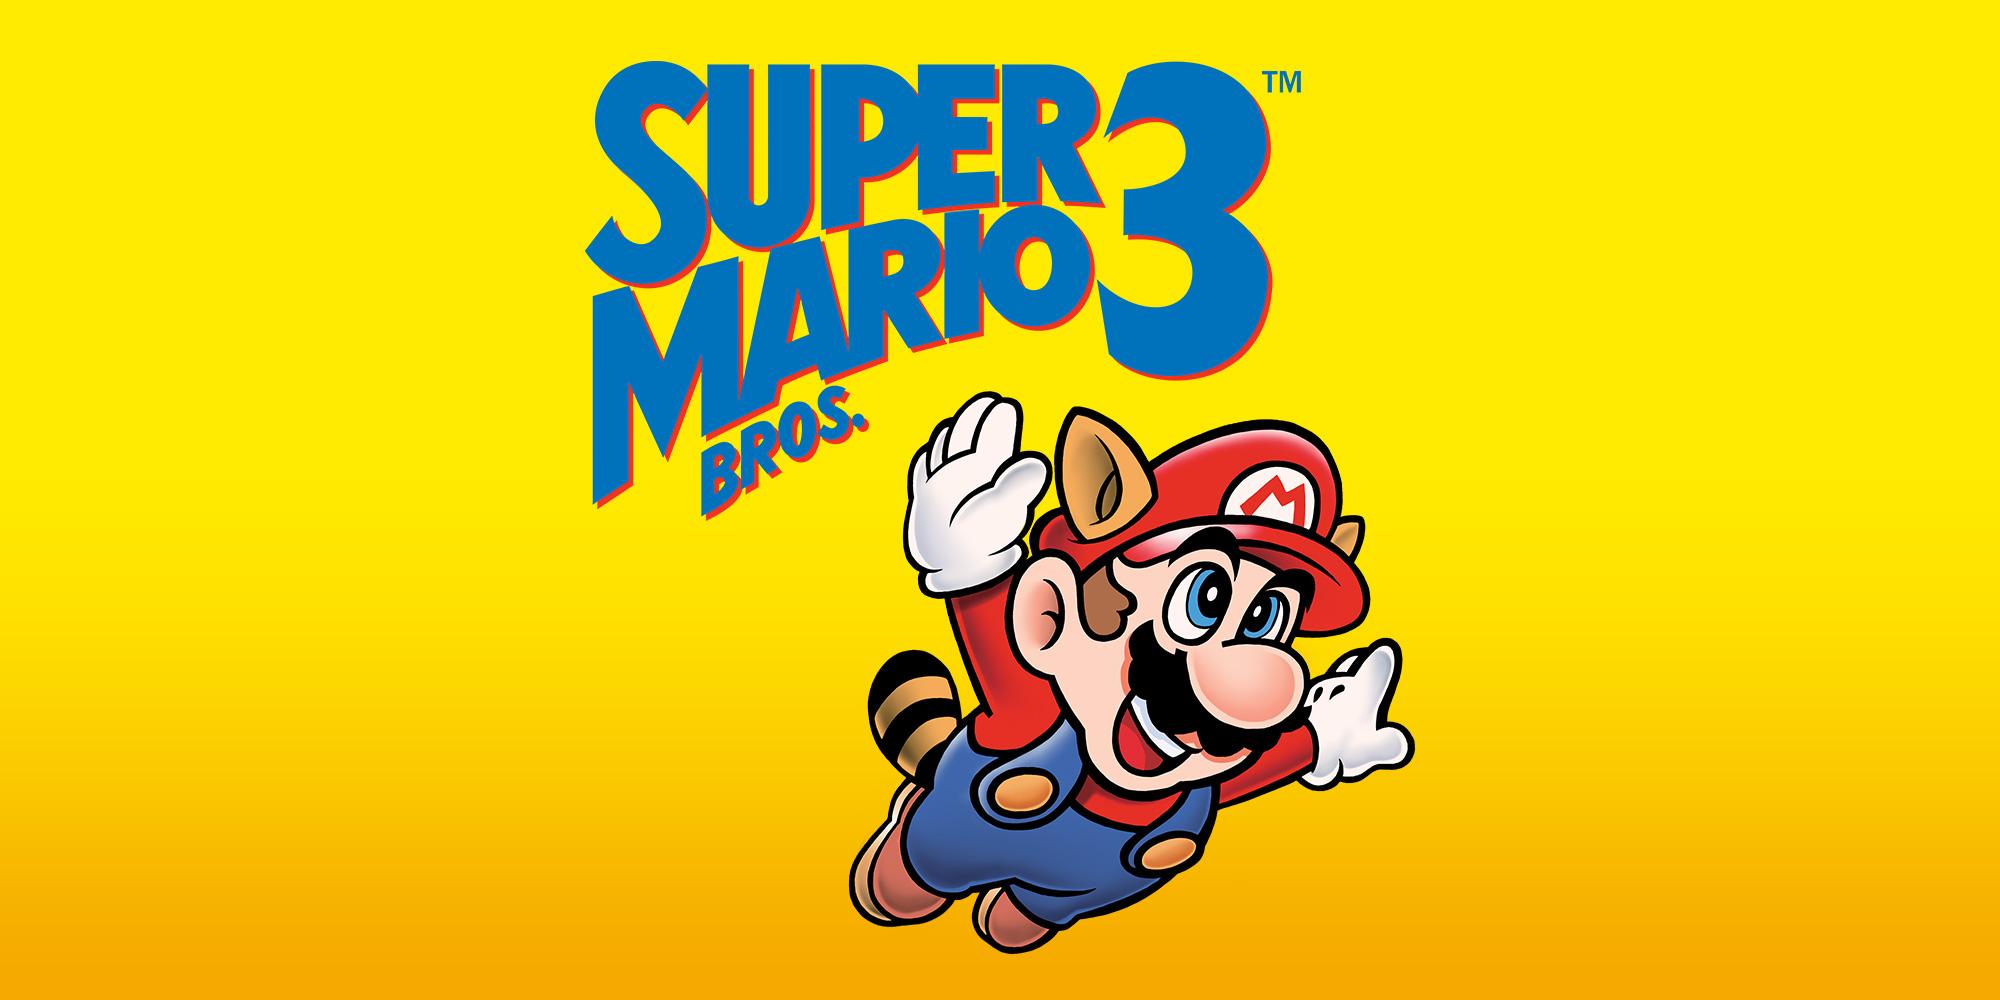 Super Mario Bros 3 - Finally completed!